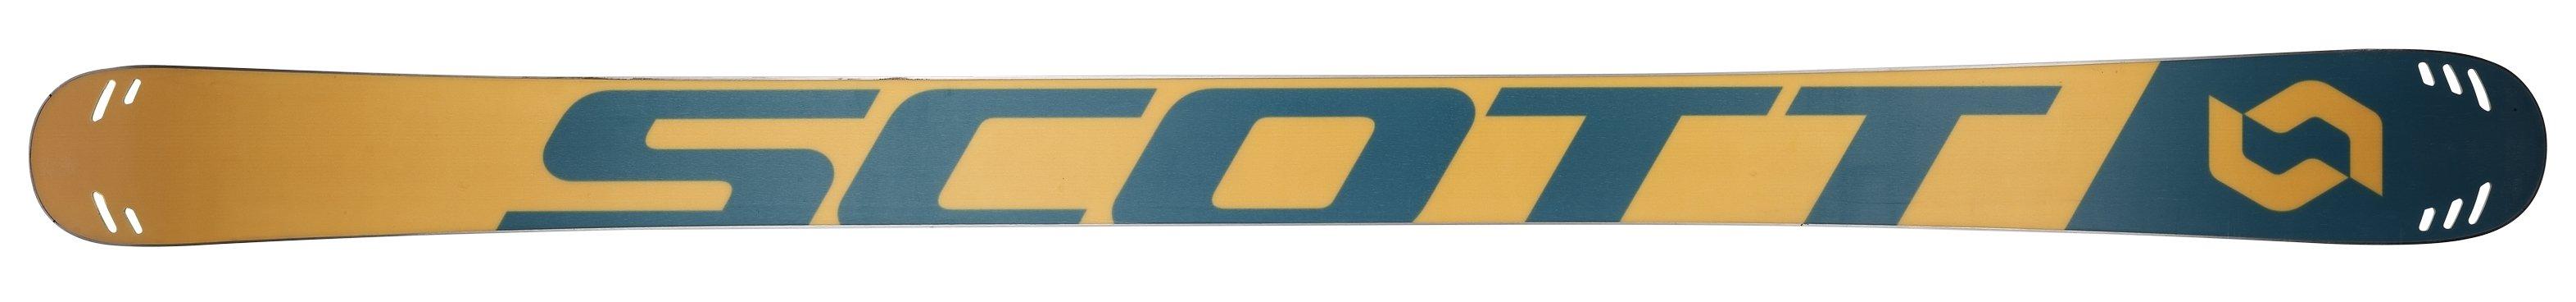 CASCADE 110